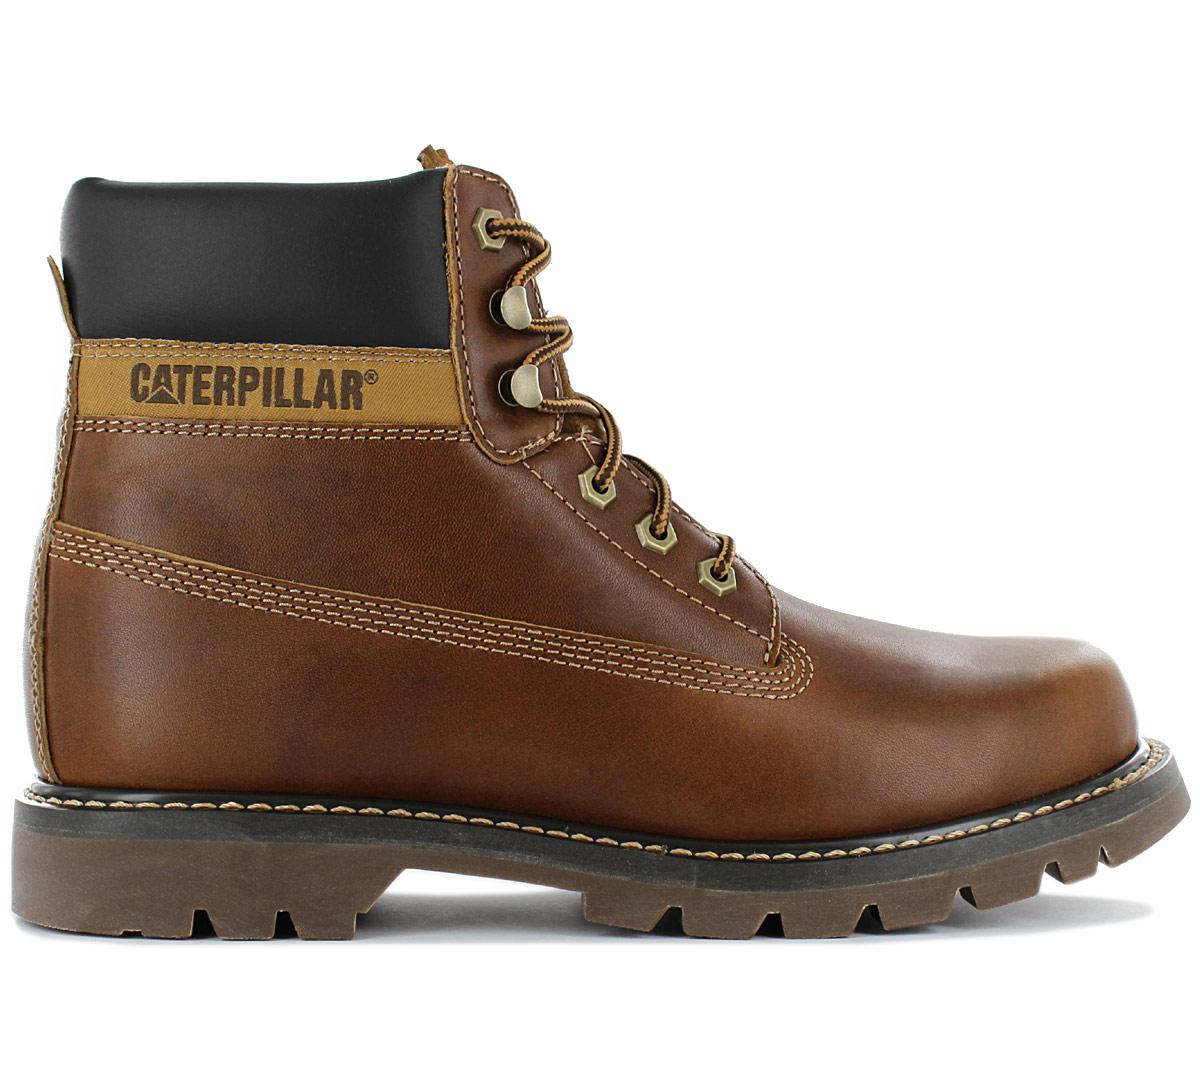 Details about Cat caterpillar Colorado Men's Boots P720263 Leather Braun Boots Winter Shoes